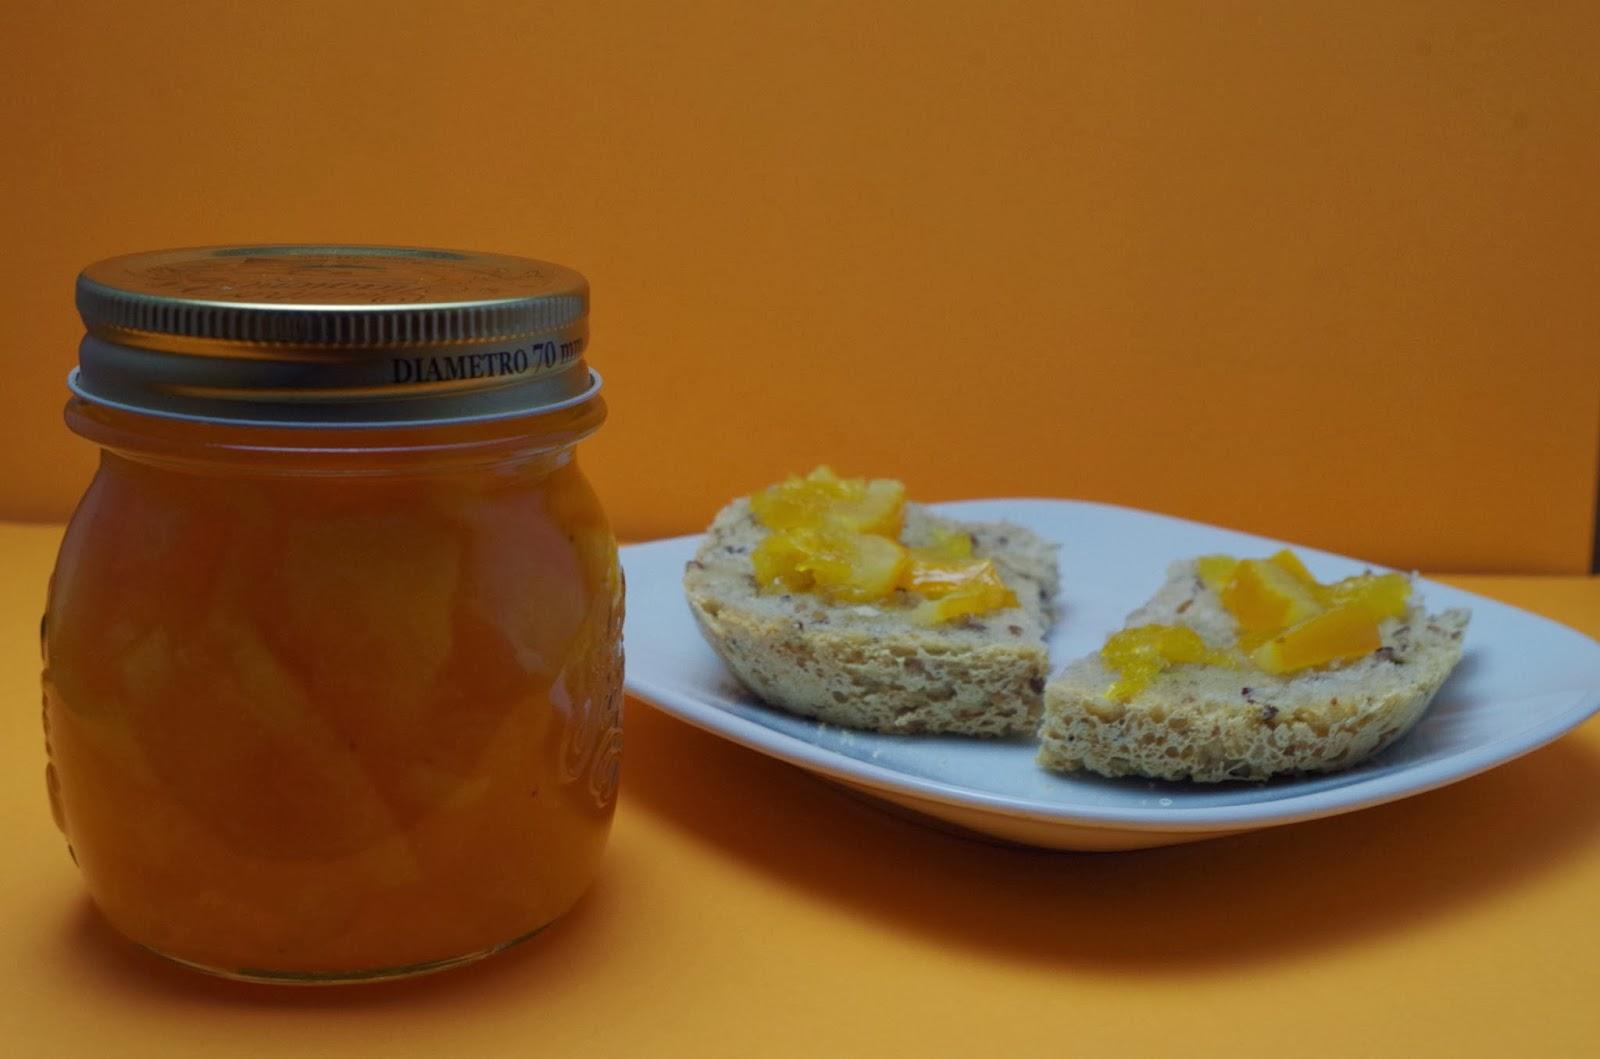 Doce de laranja com casca